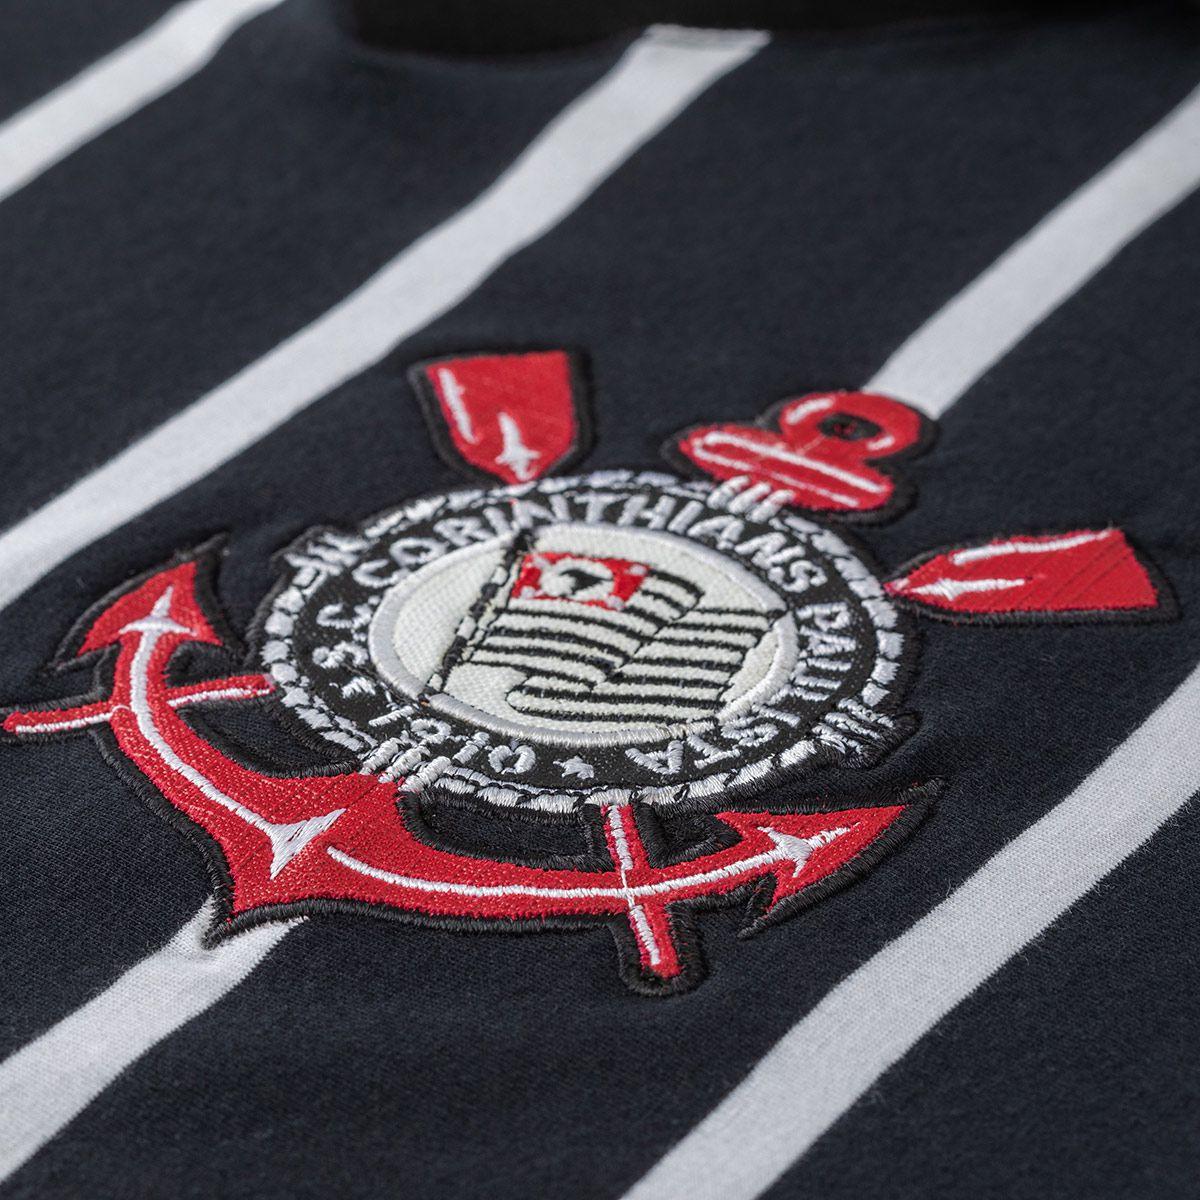 Camisa Retrô Corinthians Mundial 2012 Masculina